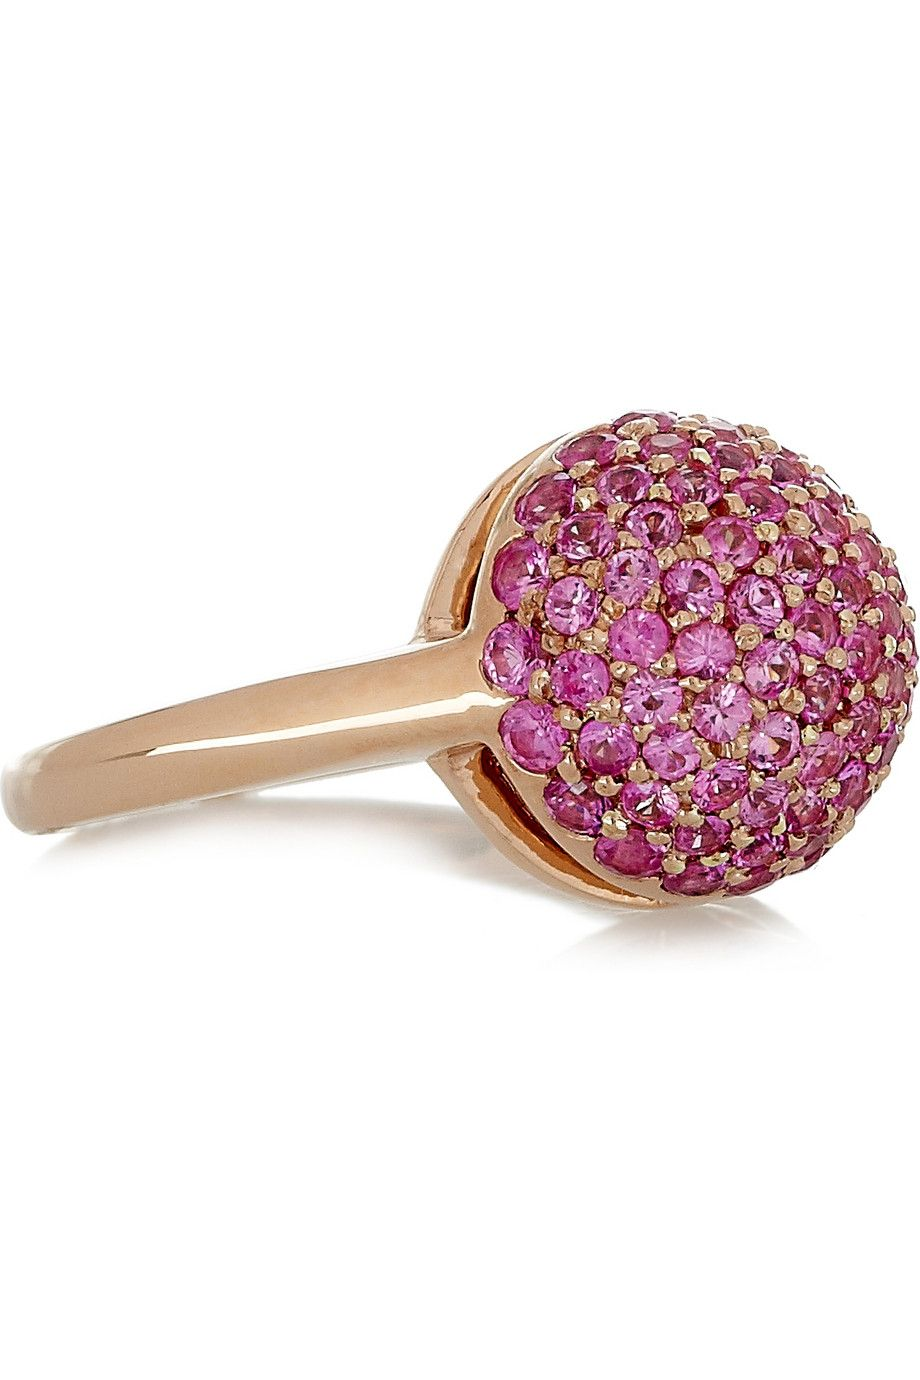 Carolina Bucci 18-karat Rose Gold Diamond Ring 83HOhpLu